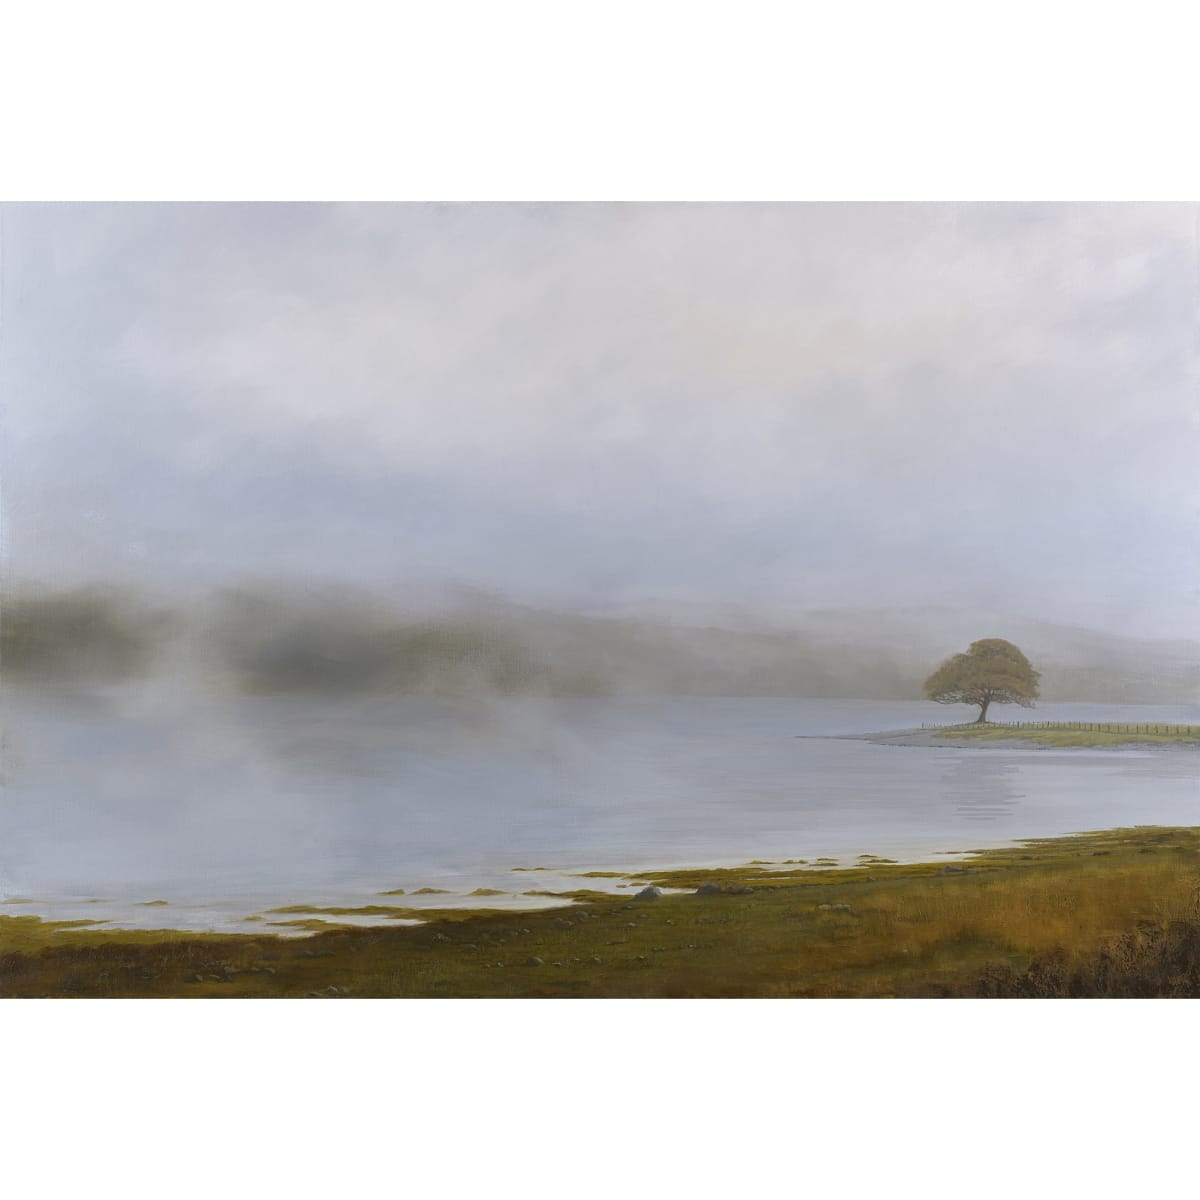 Victoria Orr Ewing Loch Eil, 2019 initialled and dated '19; titled, initialled and dated verso oil on canvas 146 x 97 cm